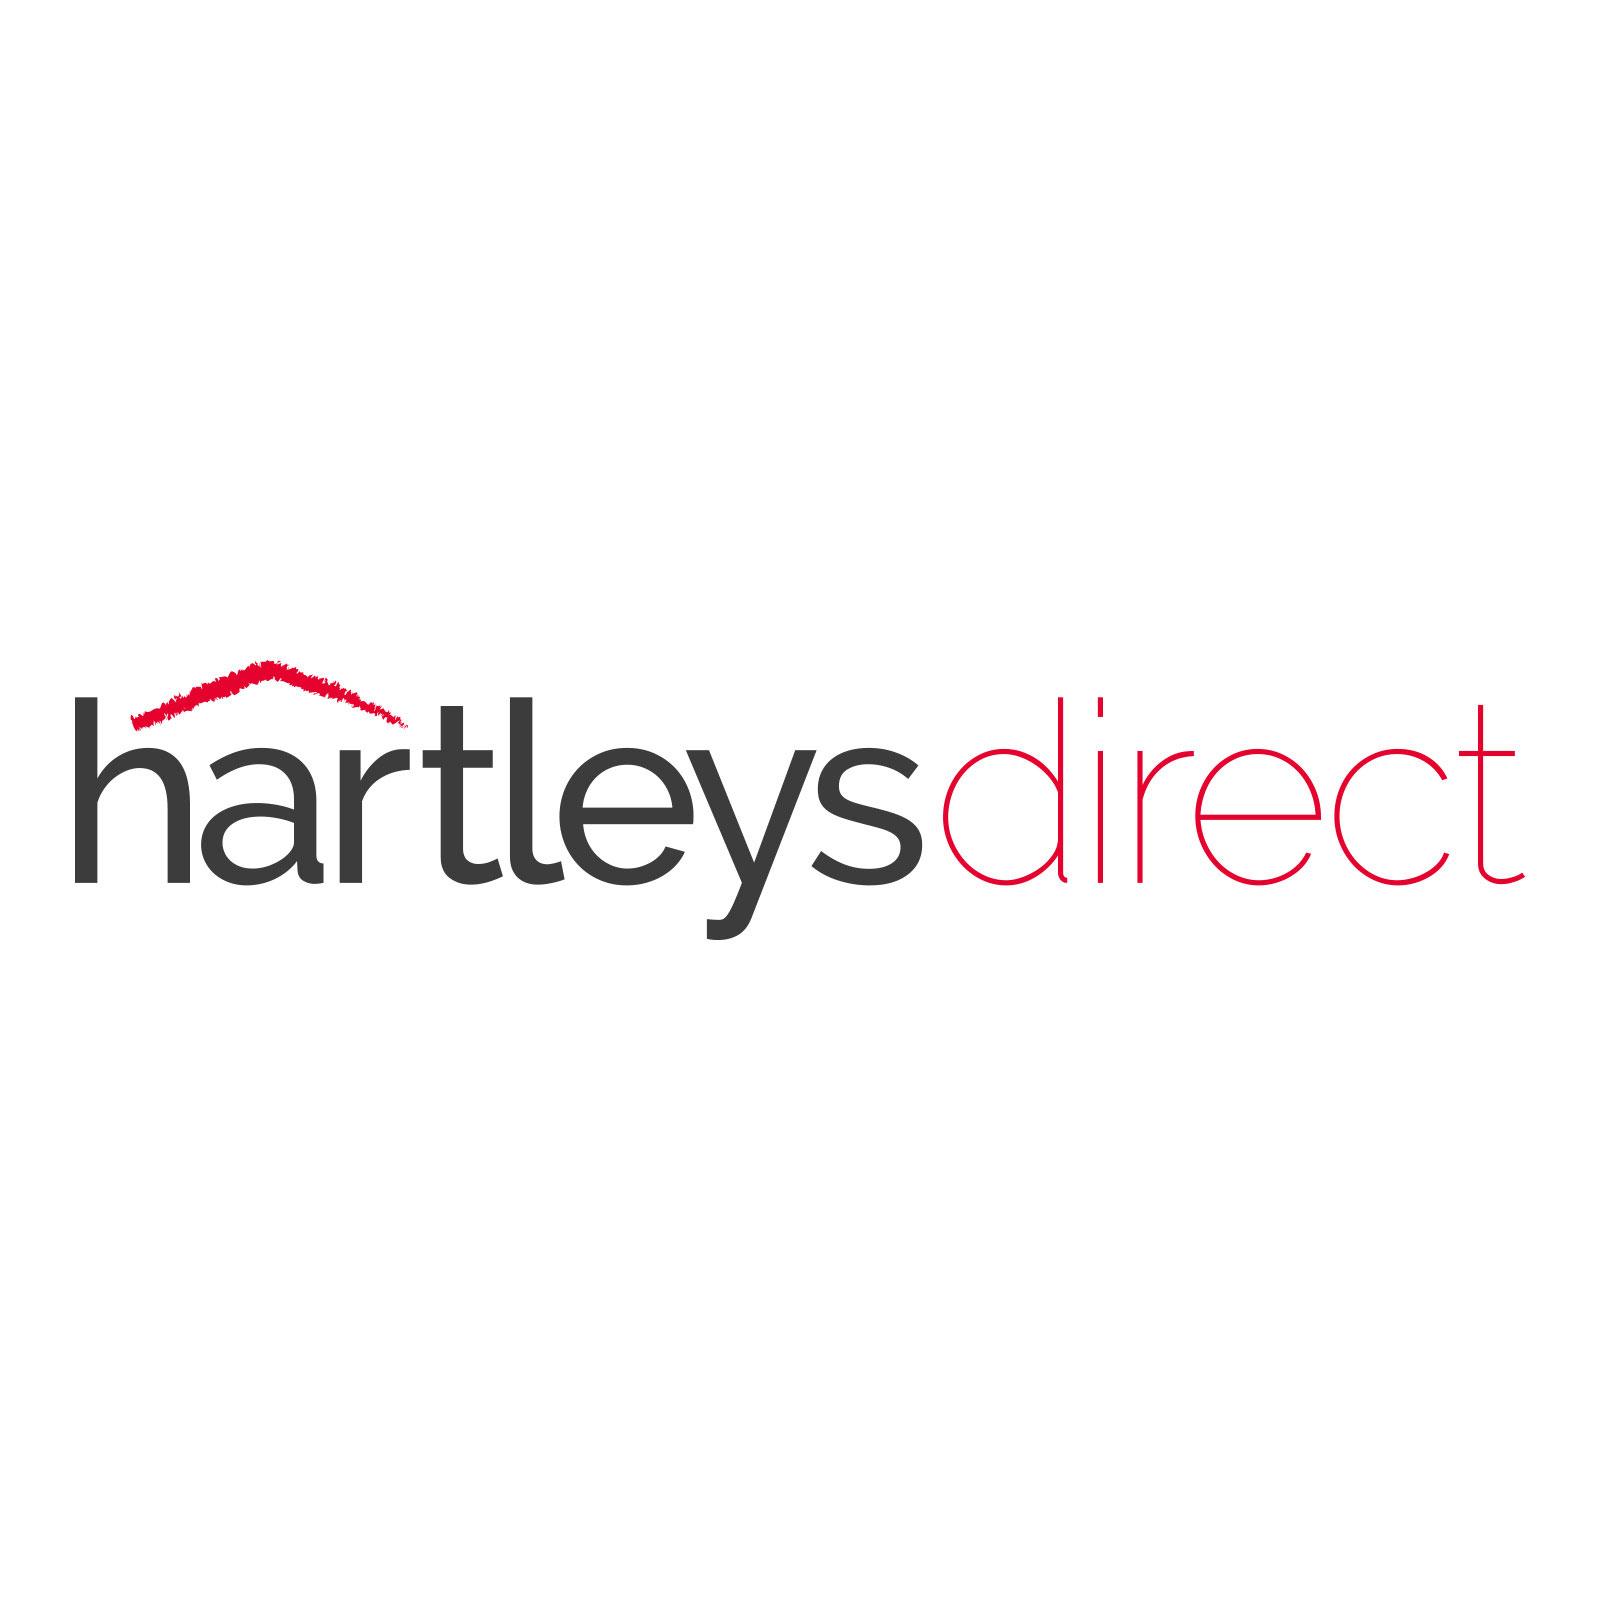 Hartleys-Chrome-Office-Chair-Base-and-Castor-Wheels-on-White-Background.jpg